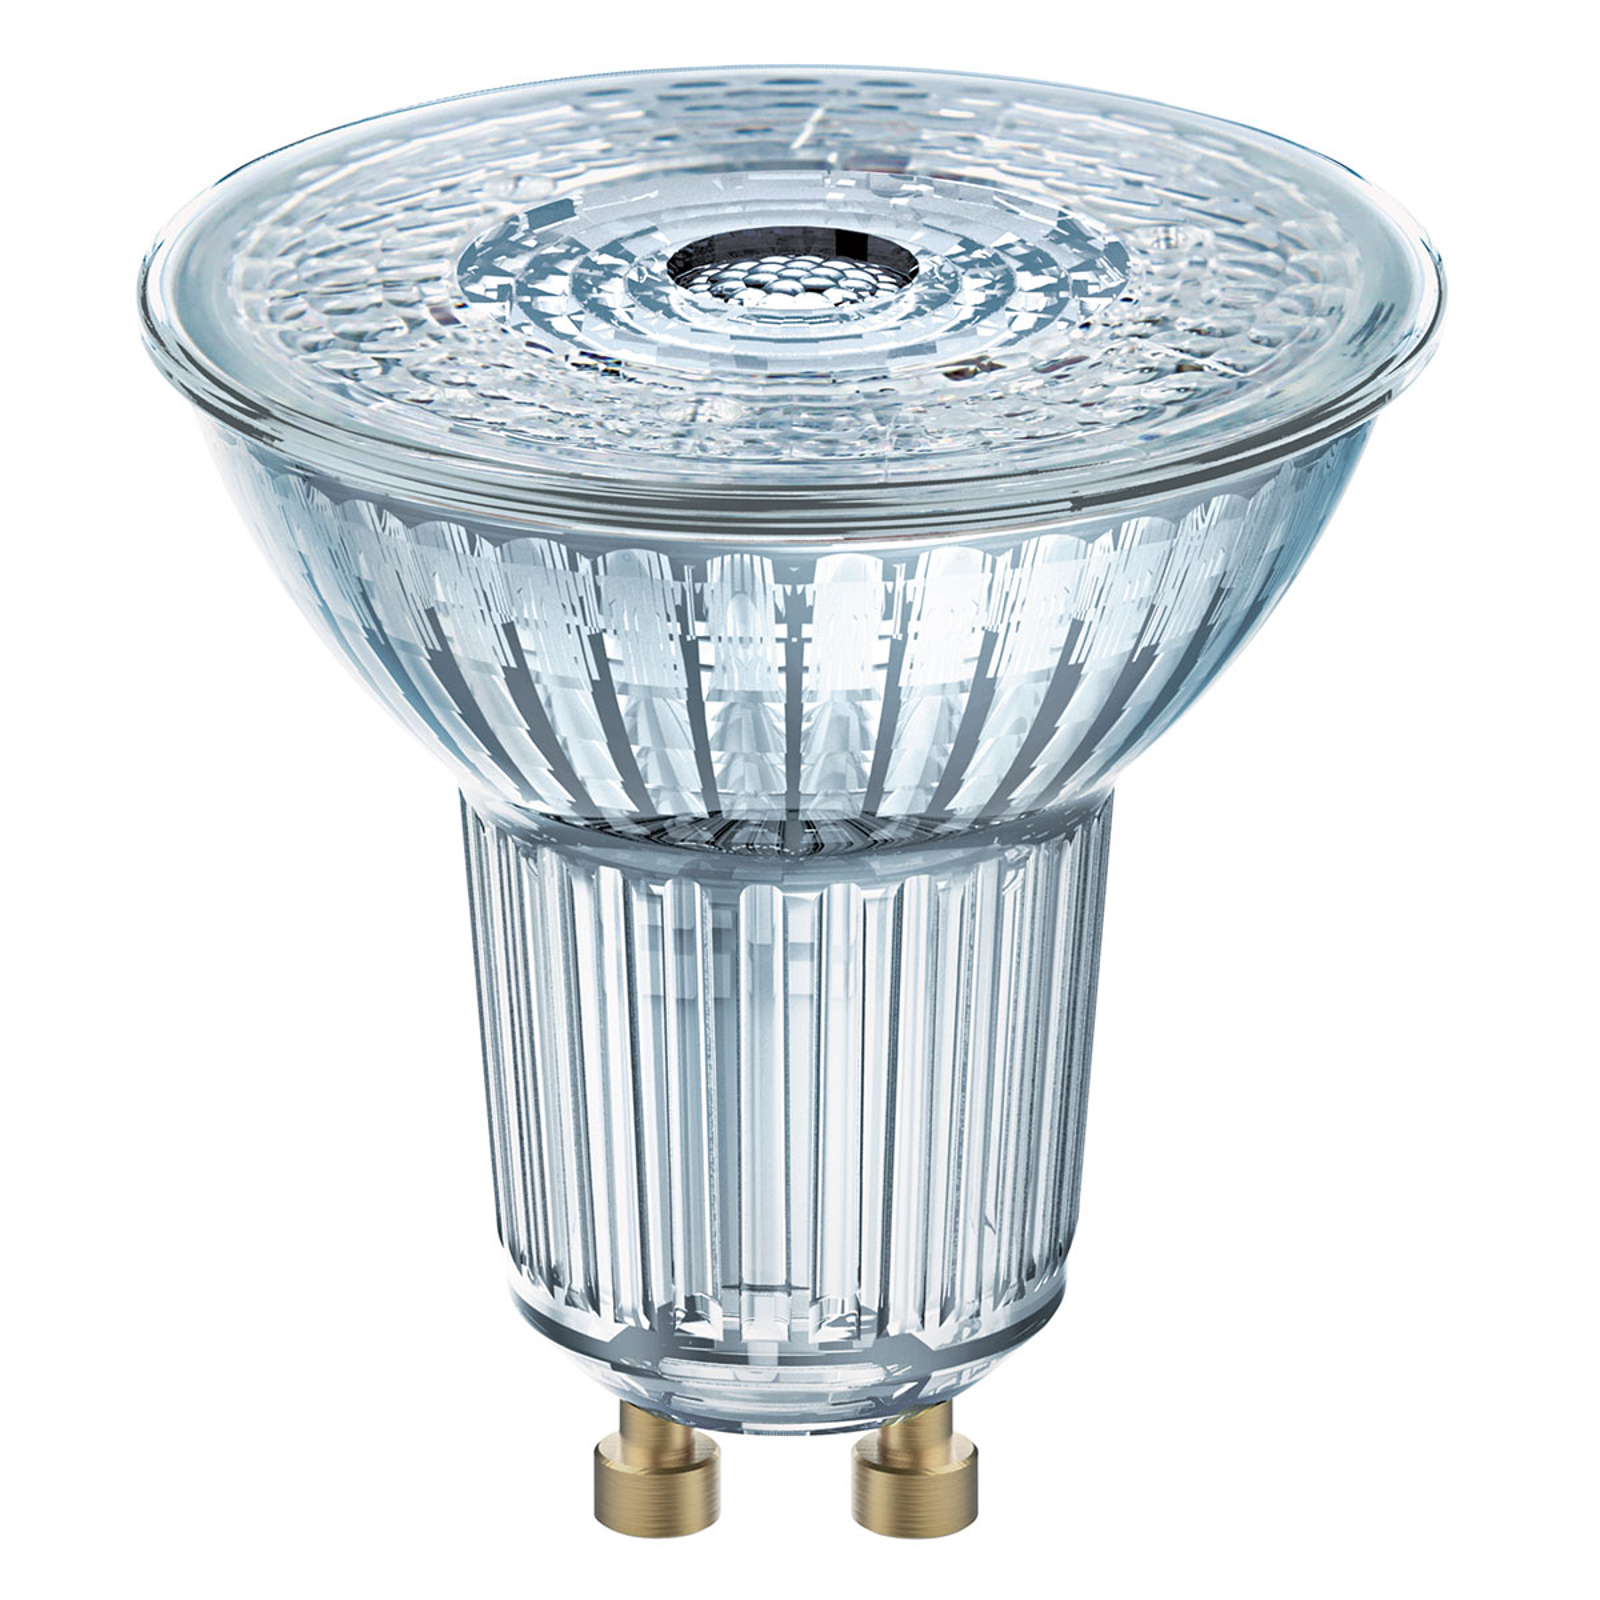 LED-reflektor GU10 4,3W, universalvit, 3-pack